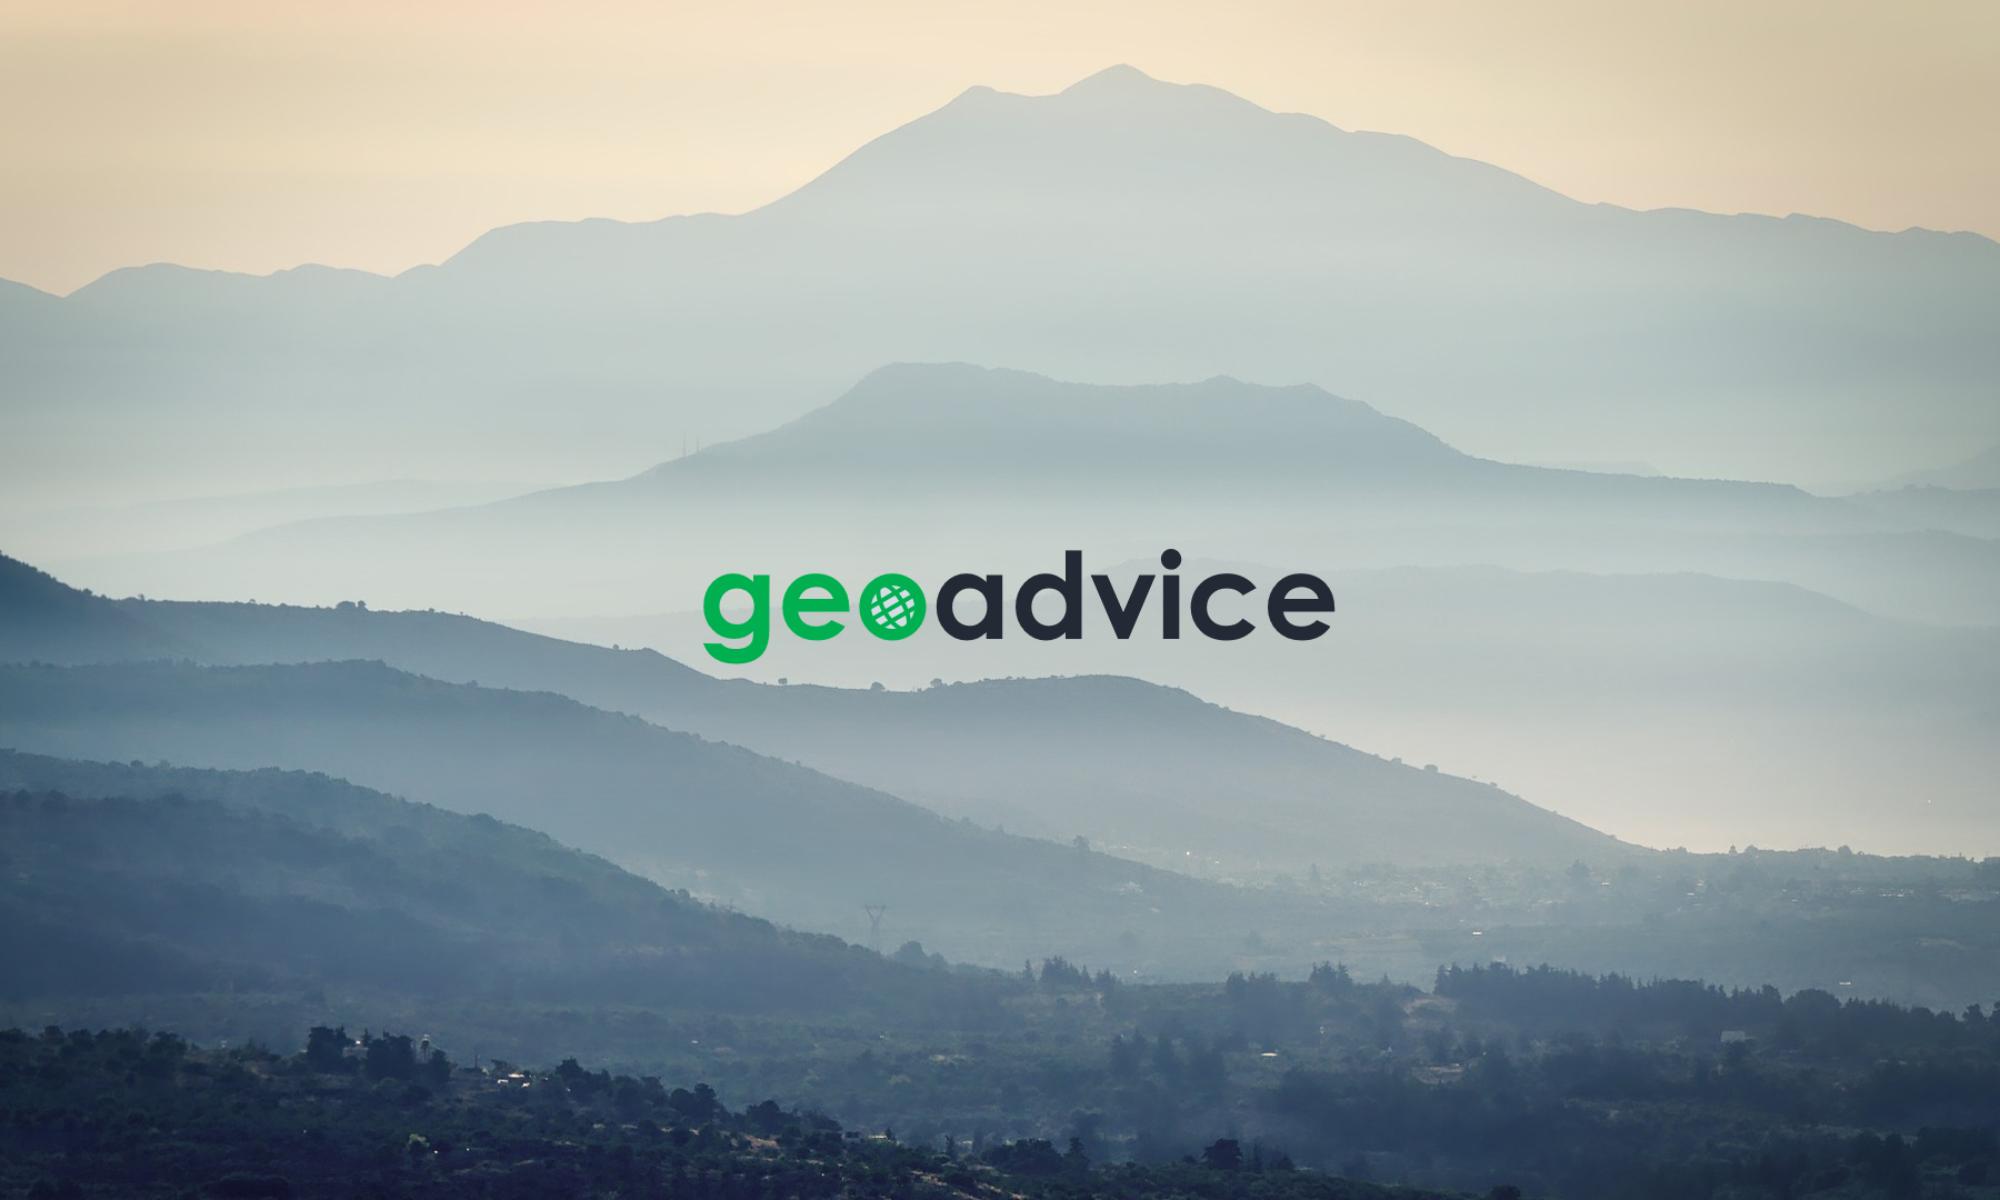 geoadvice